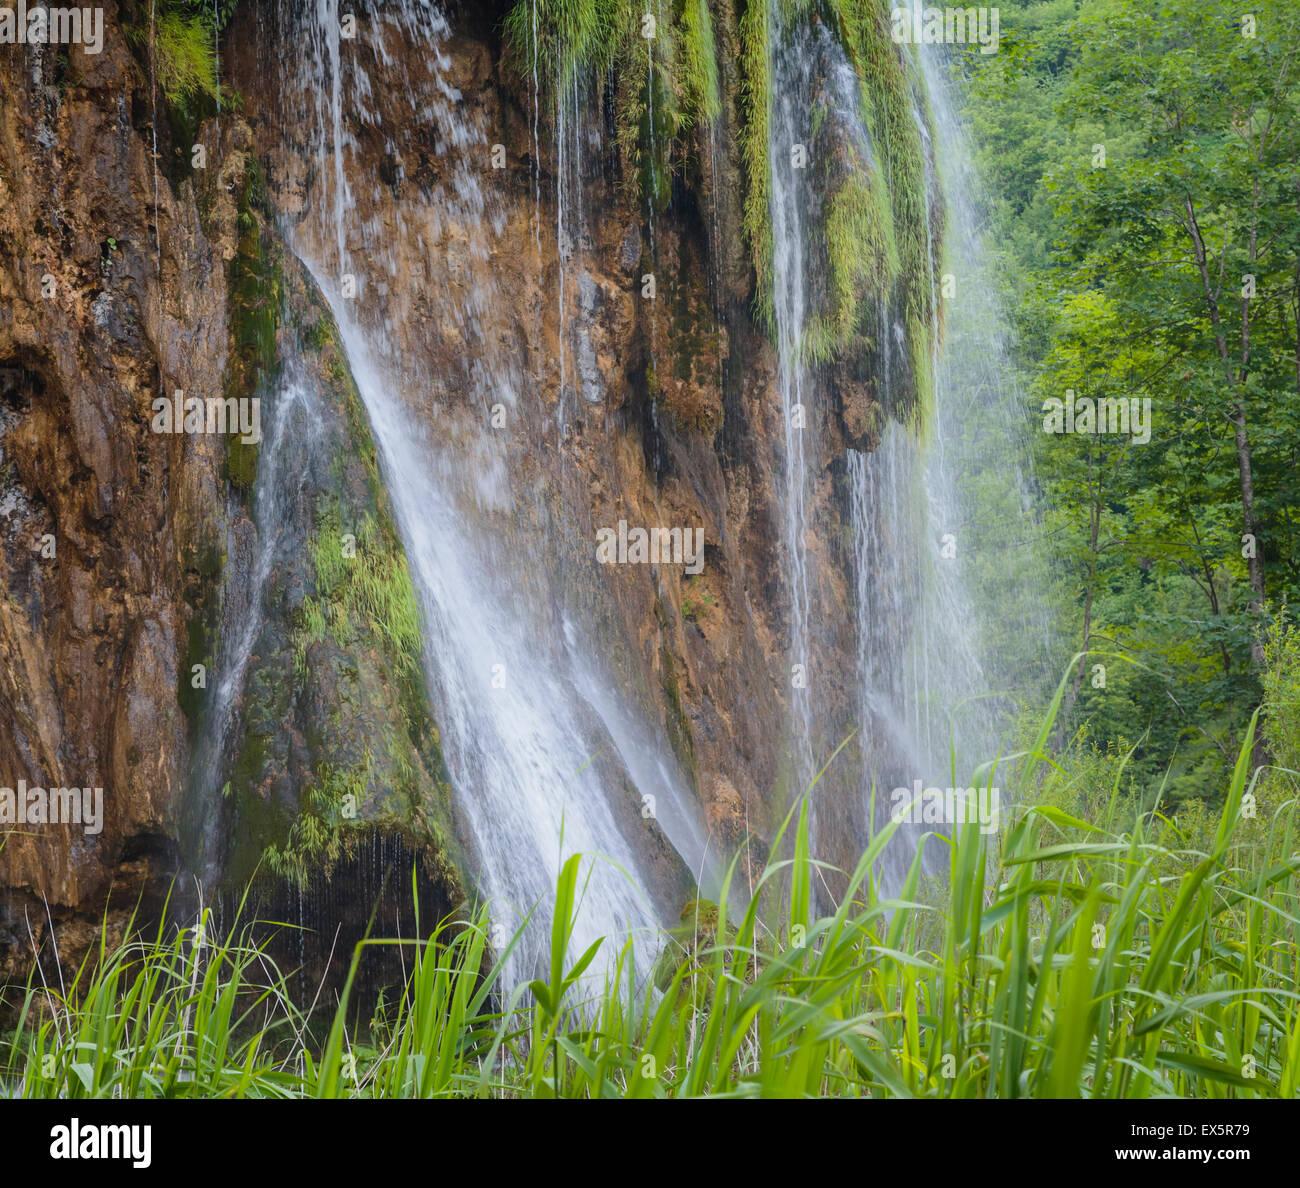 Plitvice Lakes National Park, Lika-Senj County & Karlovac County, Croatia. Waterfalls within the Park. - Stock Image